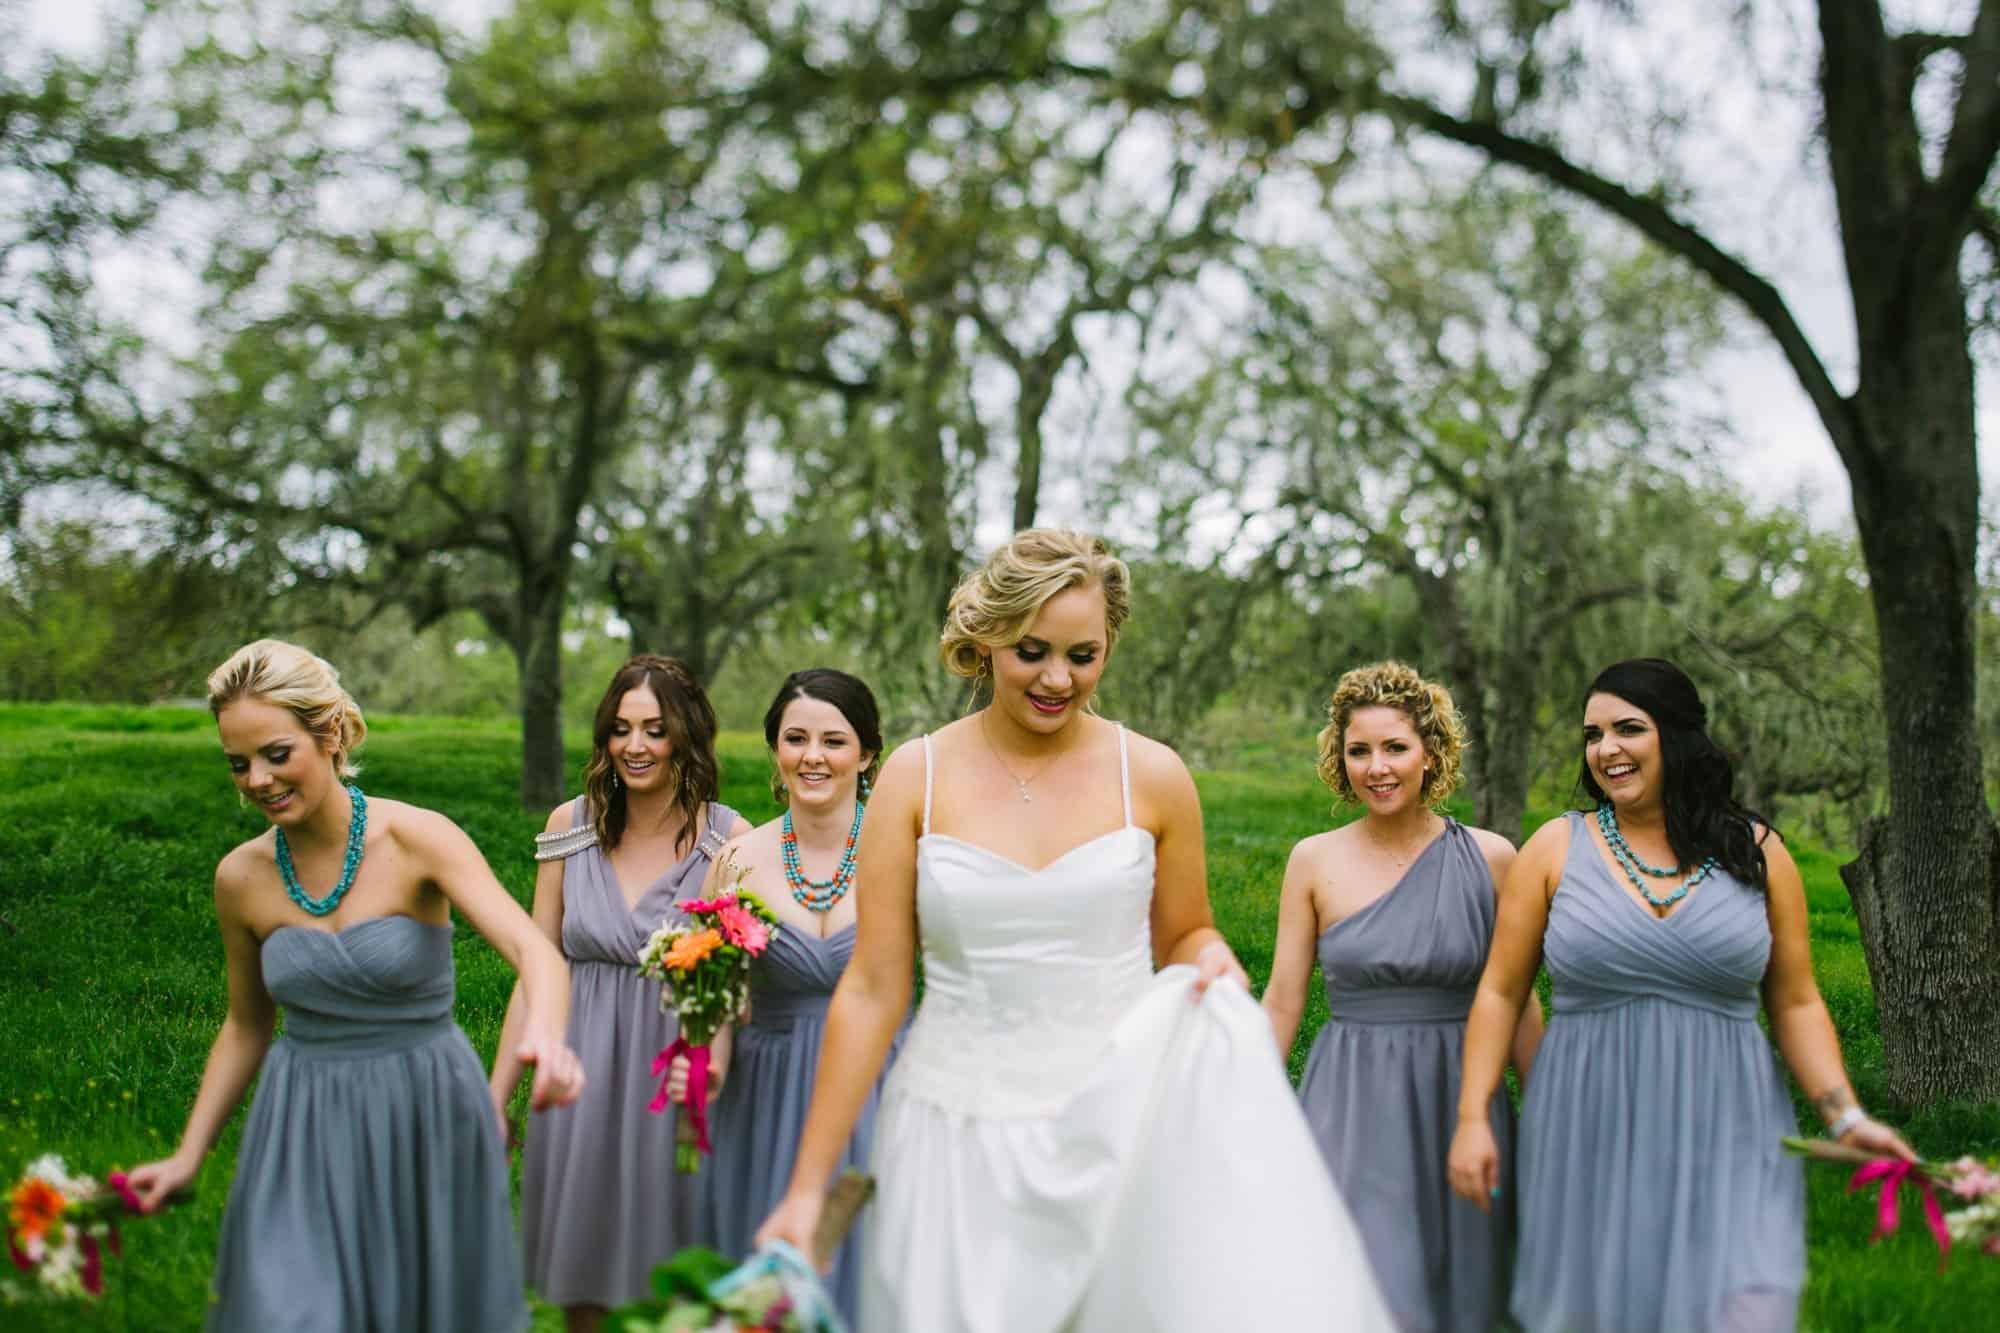 seitz_paso_robles_wedding-21